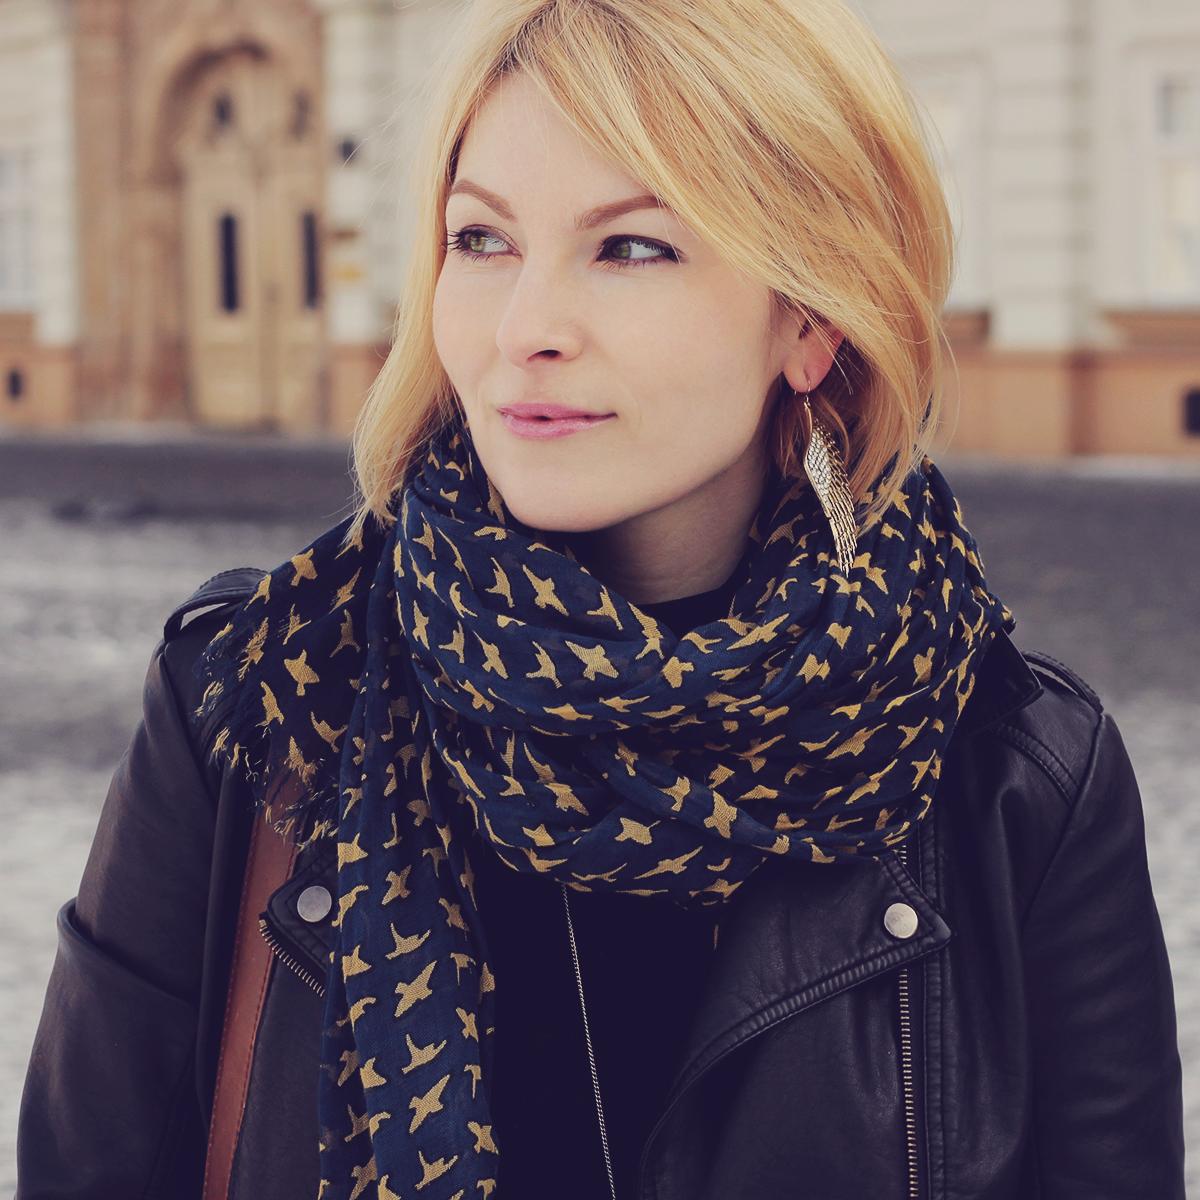 the bird pattern scarf